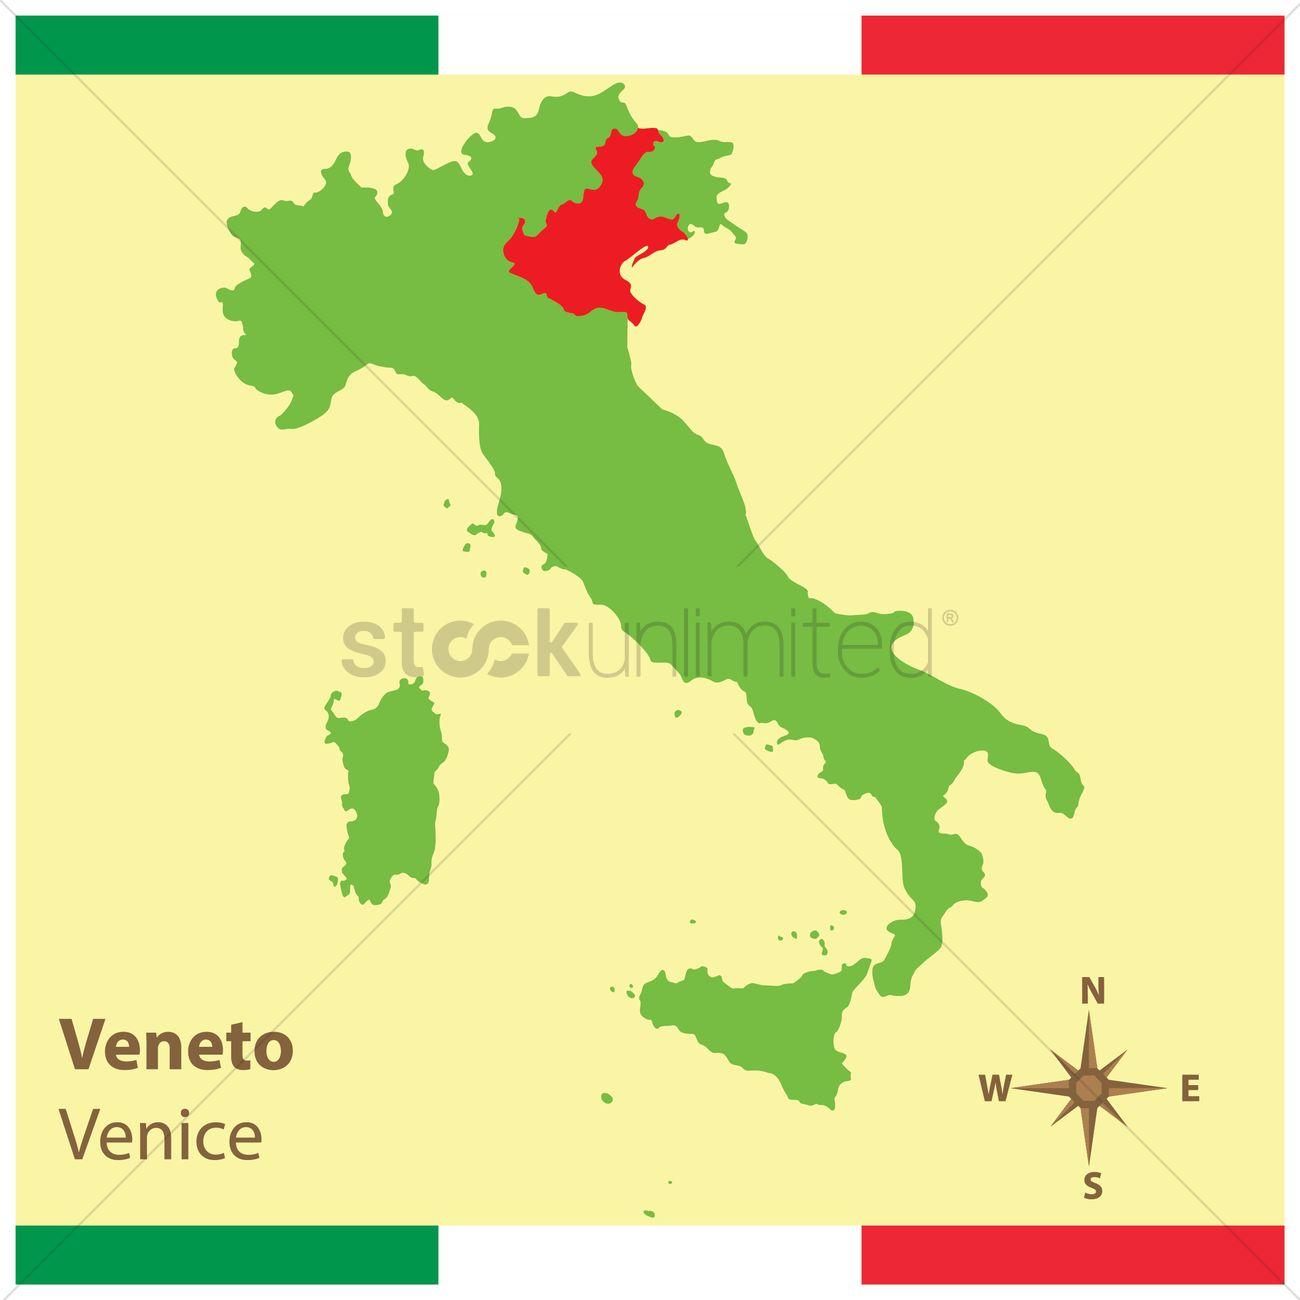 Veneto On Italy Map Vector Image 1583939 Stockunlimited